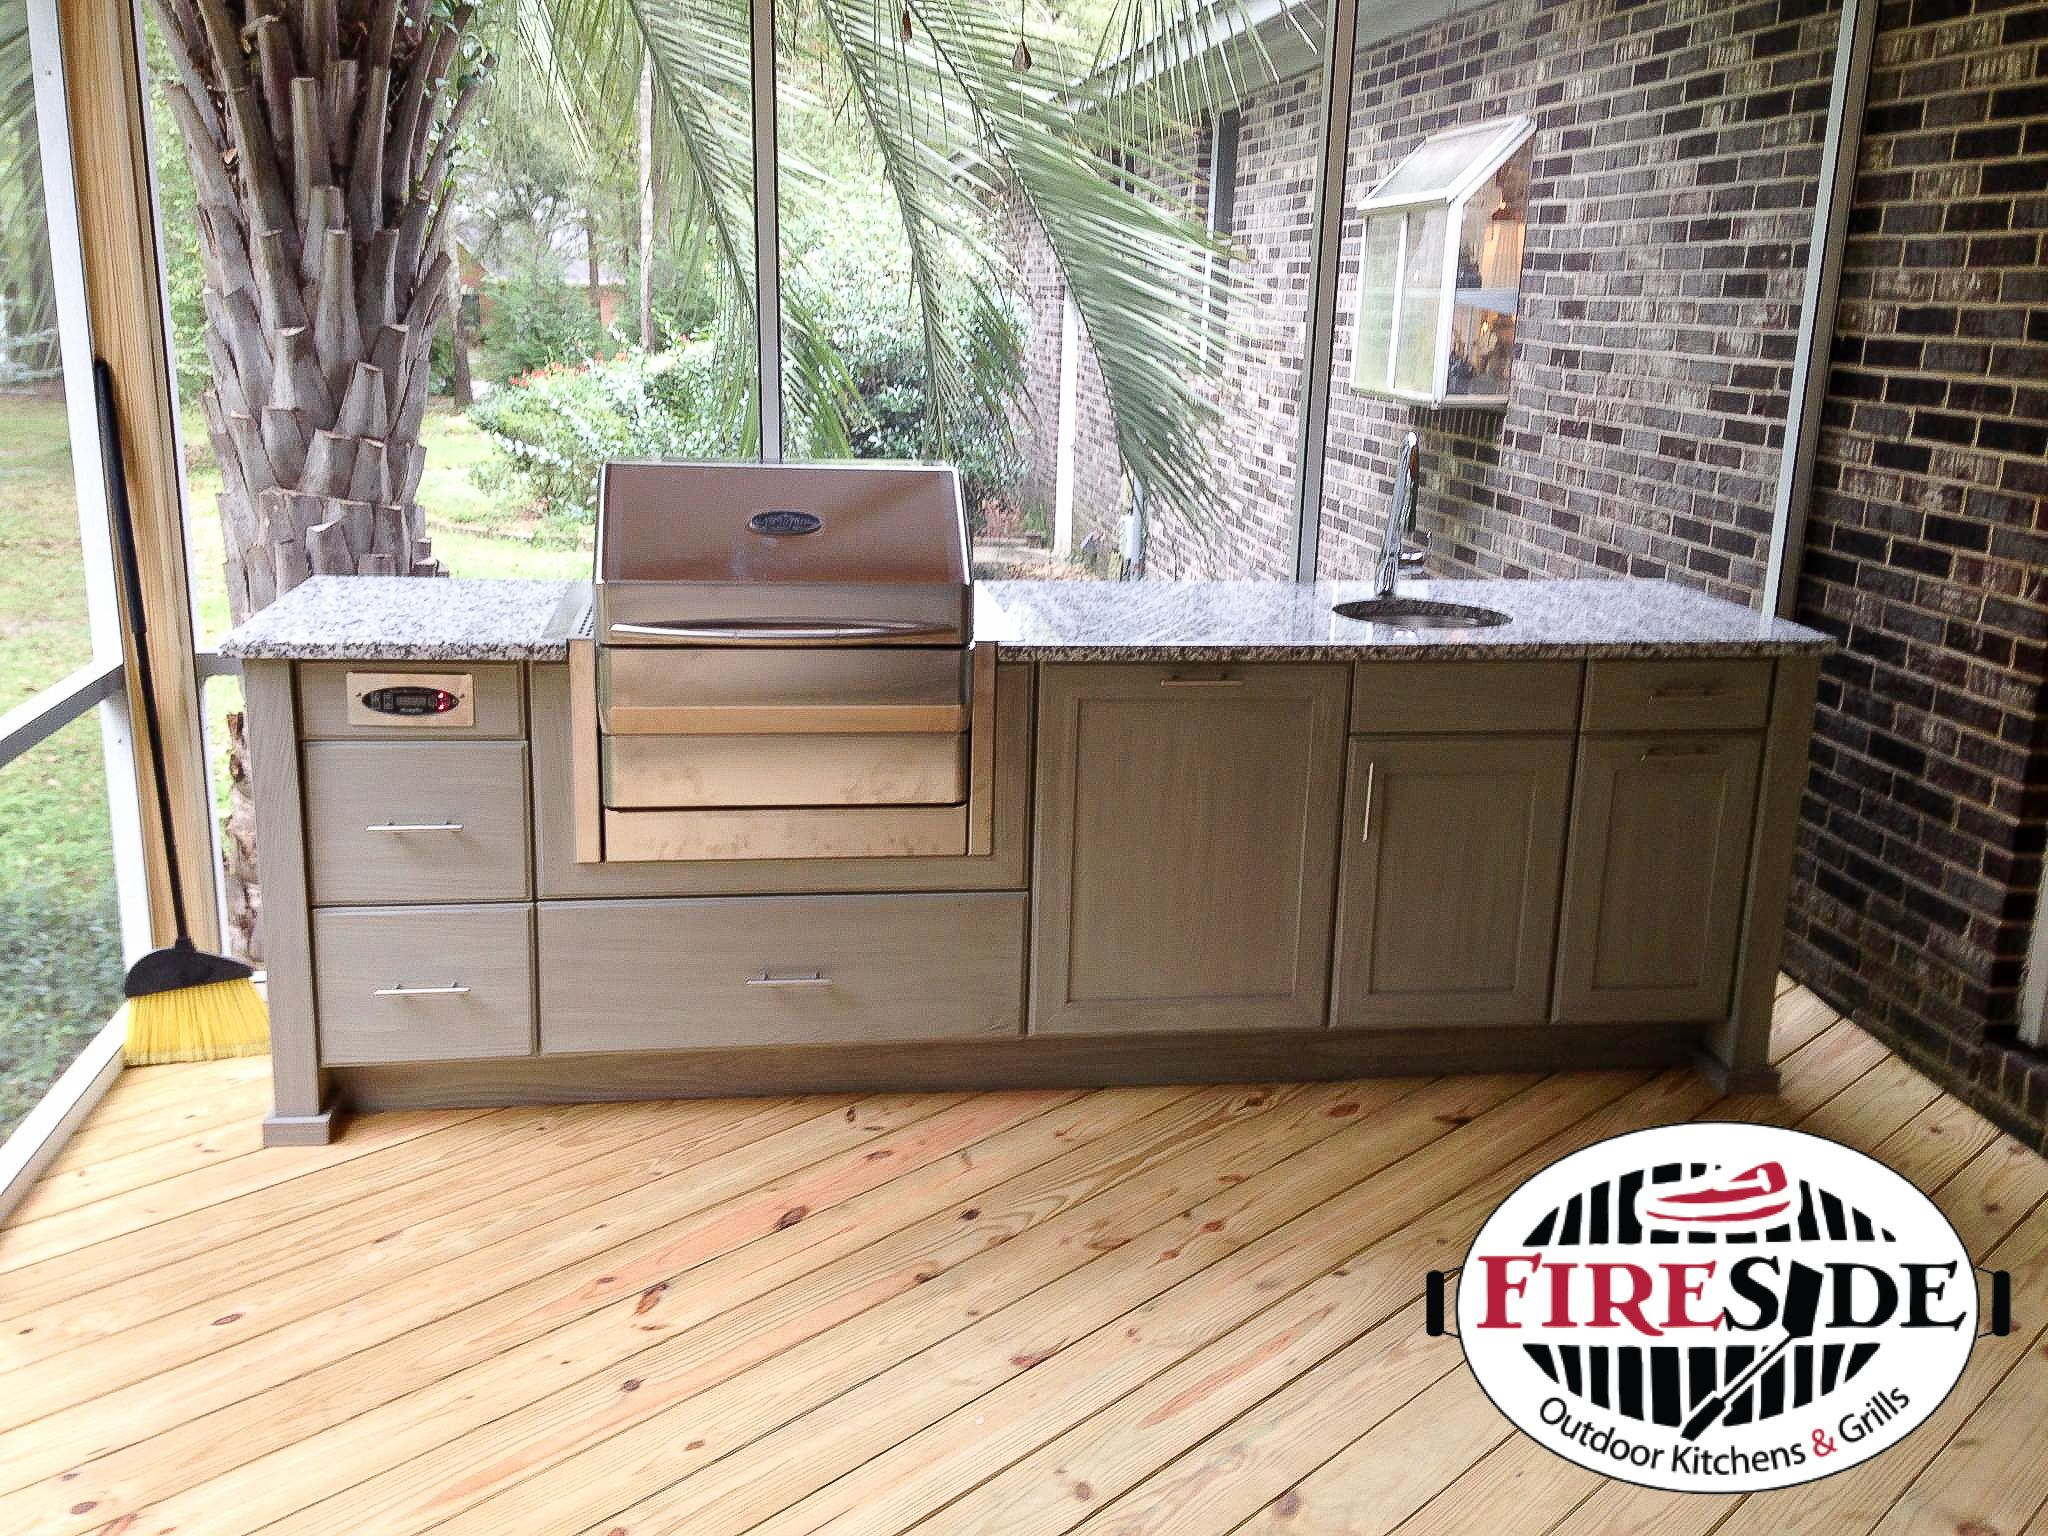 Naturekast Cabinetry Memphis Pro Pellet Grill Outdoor Cabinet Outdoor Kitchen Outdoor Kitchen Plans